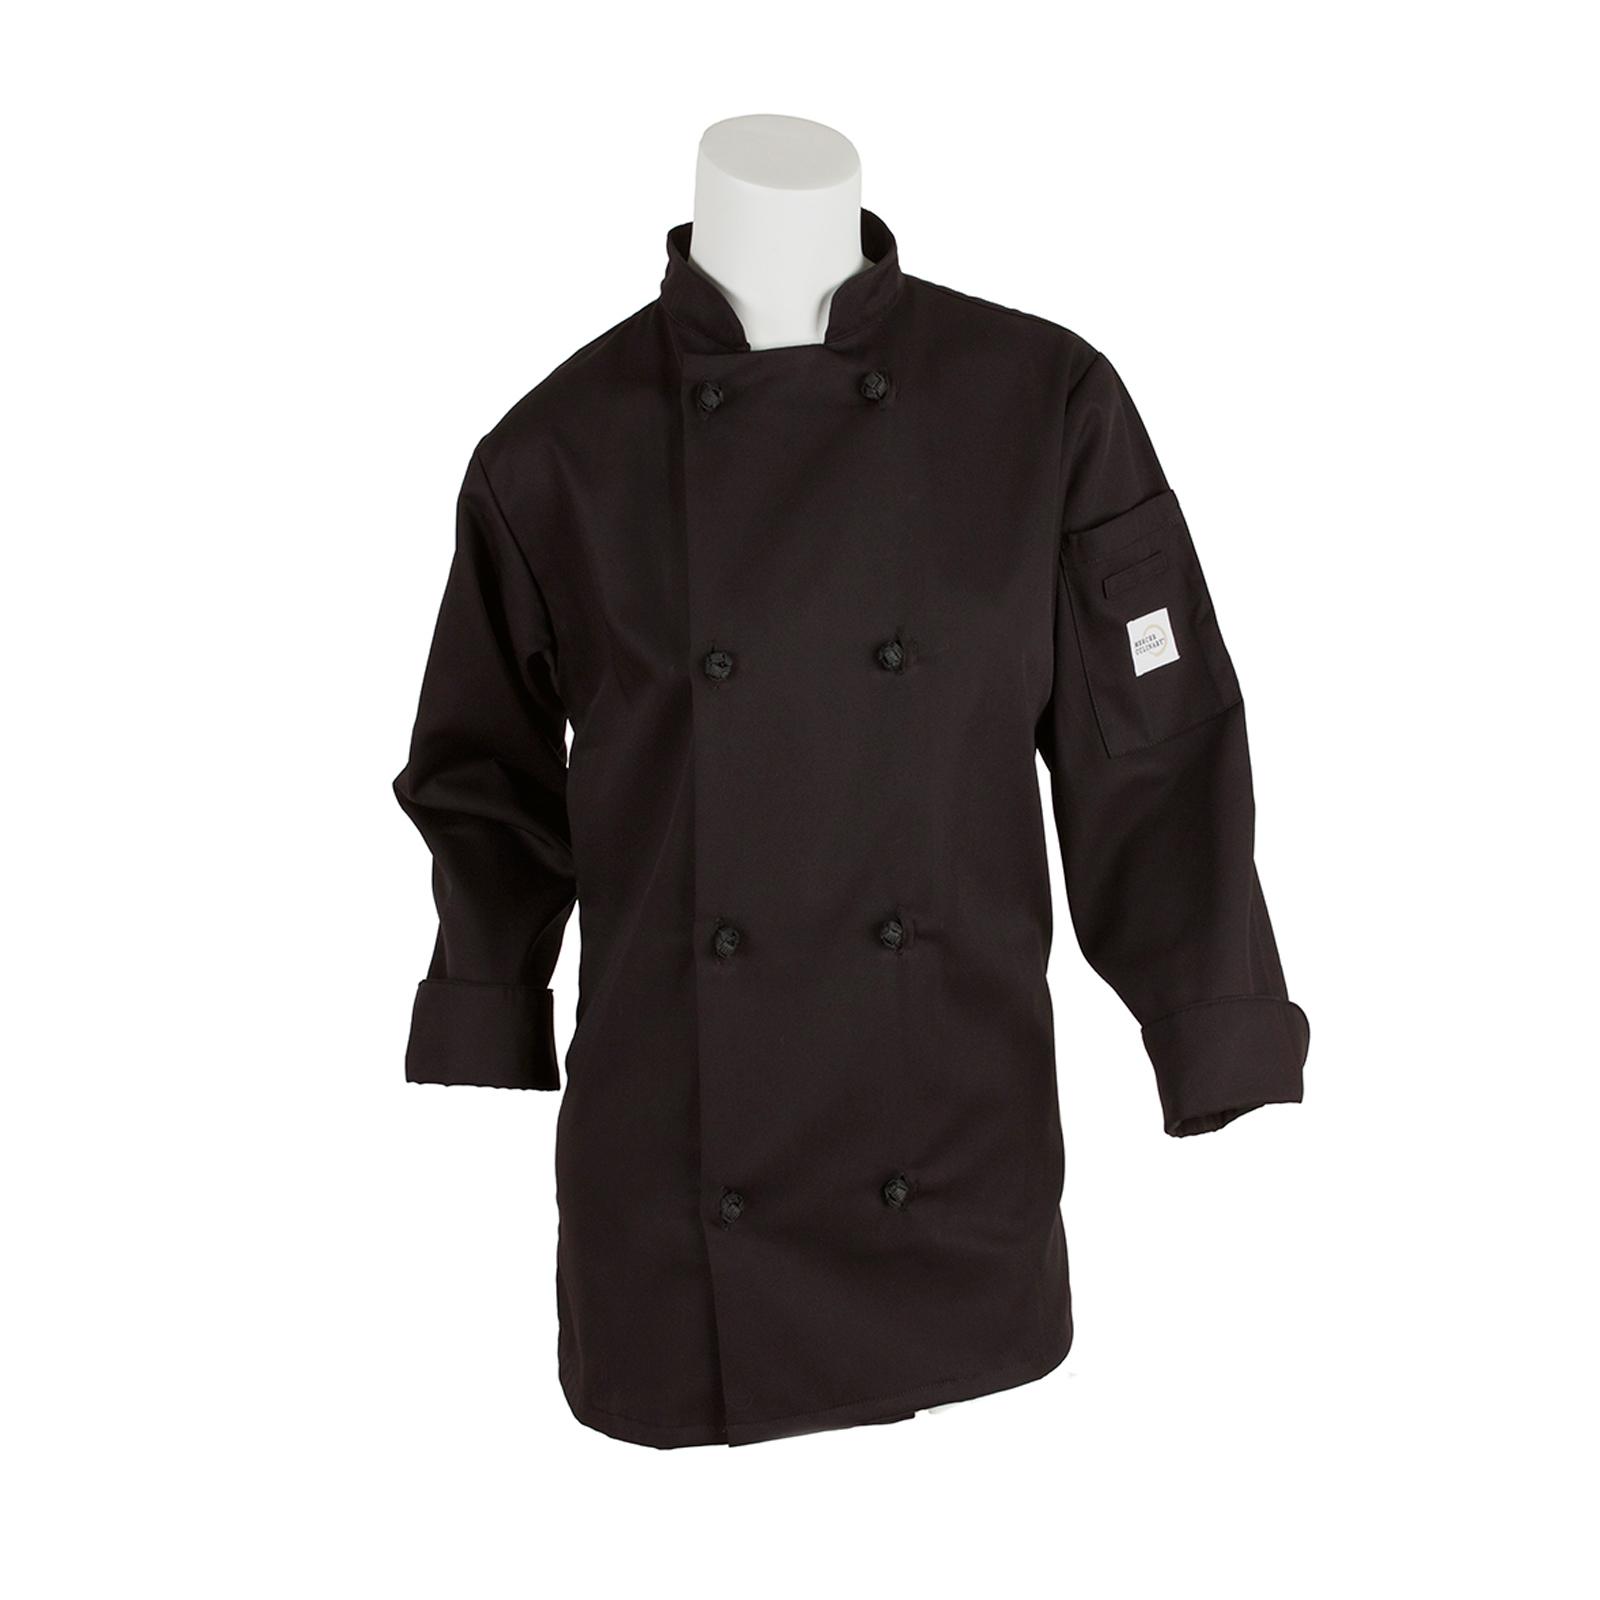 Mercer Culinary M60022BKXXS chef's coat